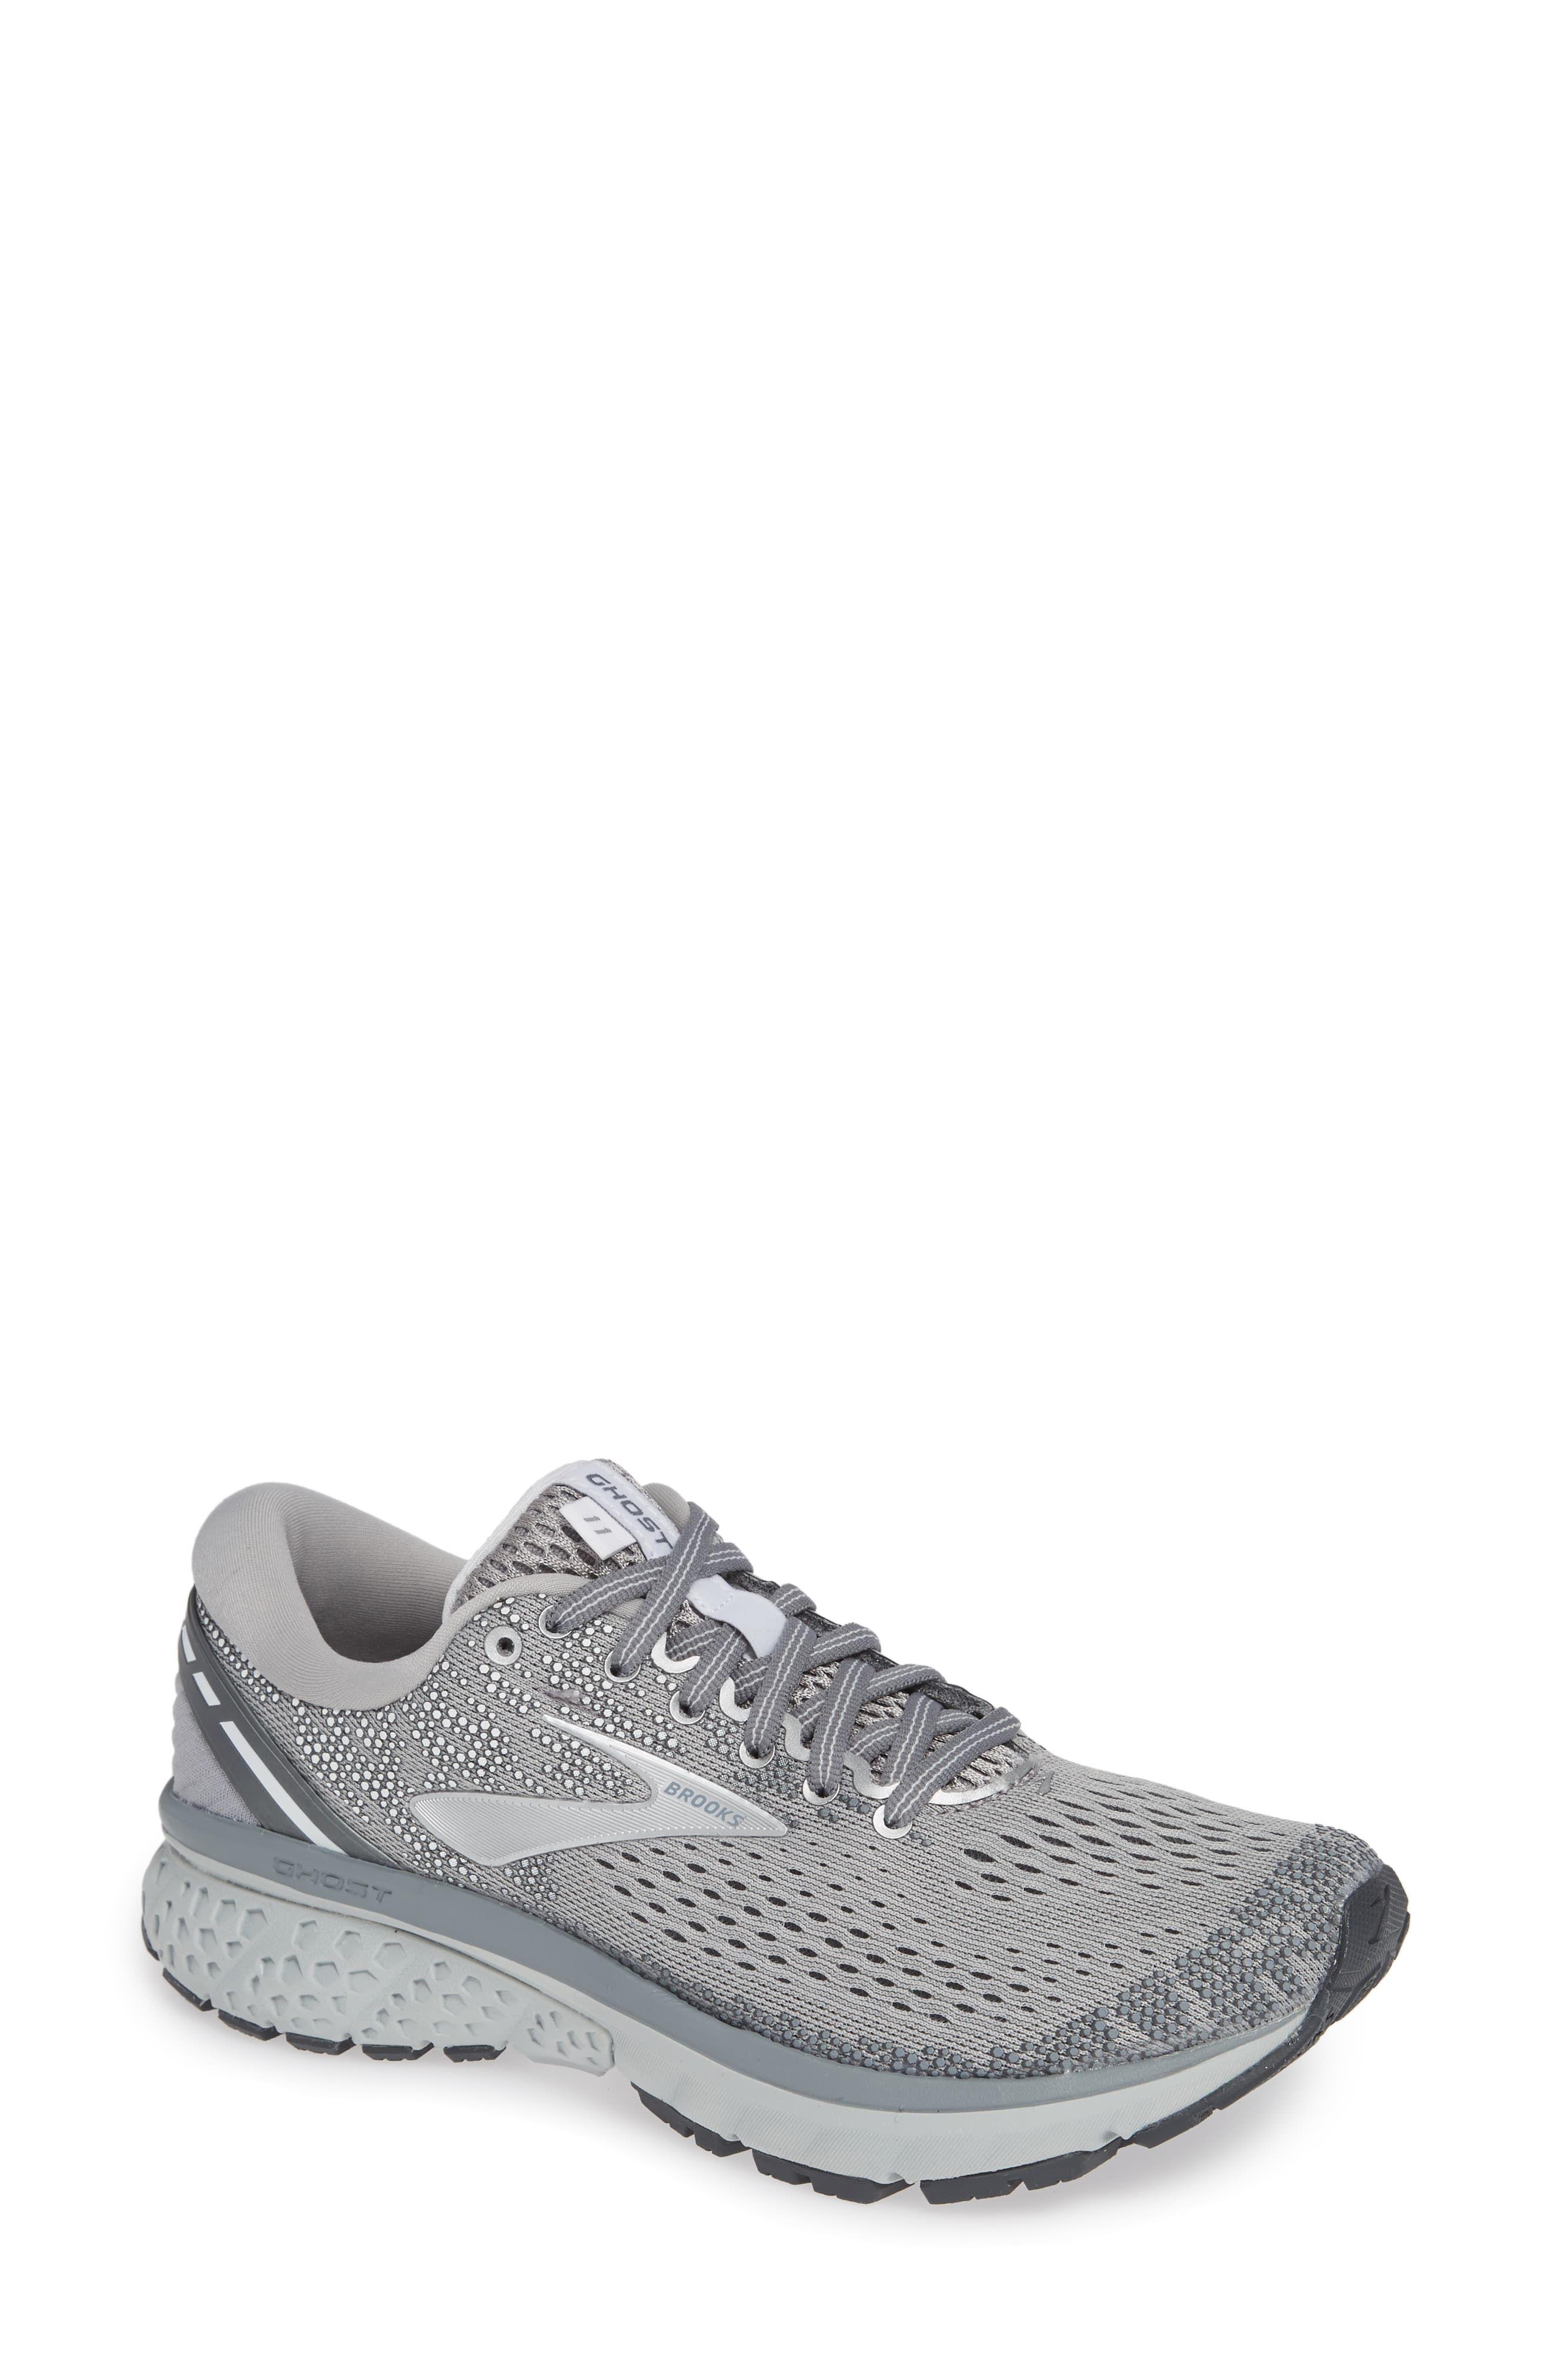 Brooks Ghost 11 Running Shoe (Women